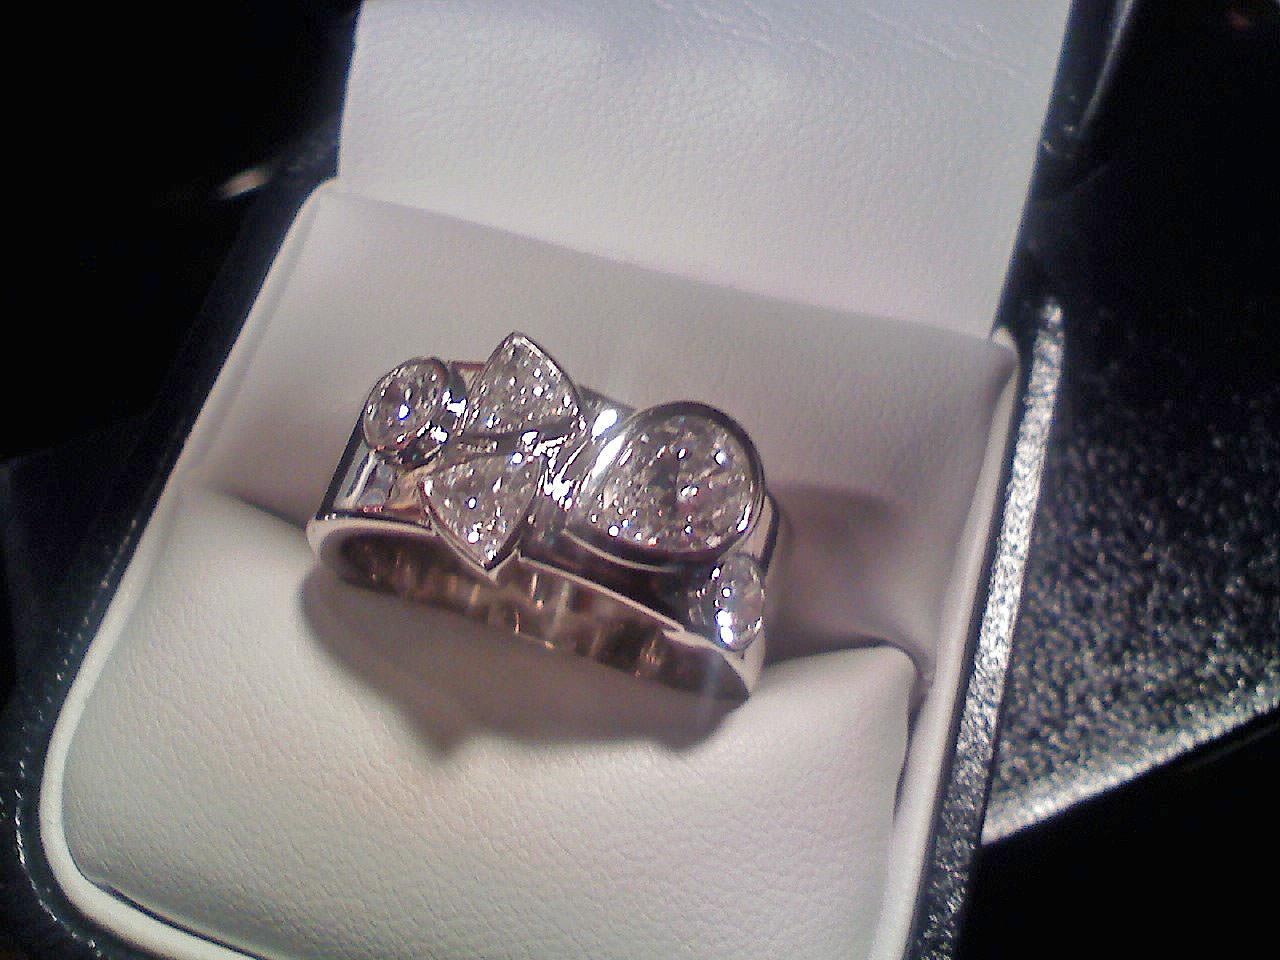 30 Pear Shaped Diamond Ring Designs Trends Models  Design Trends  Premium PSD Vector Downloads